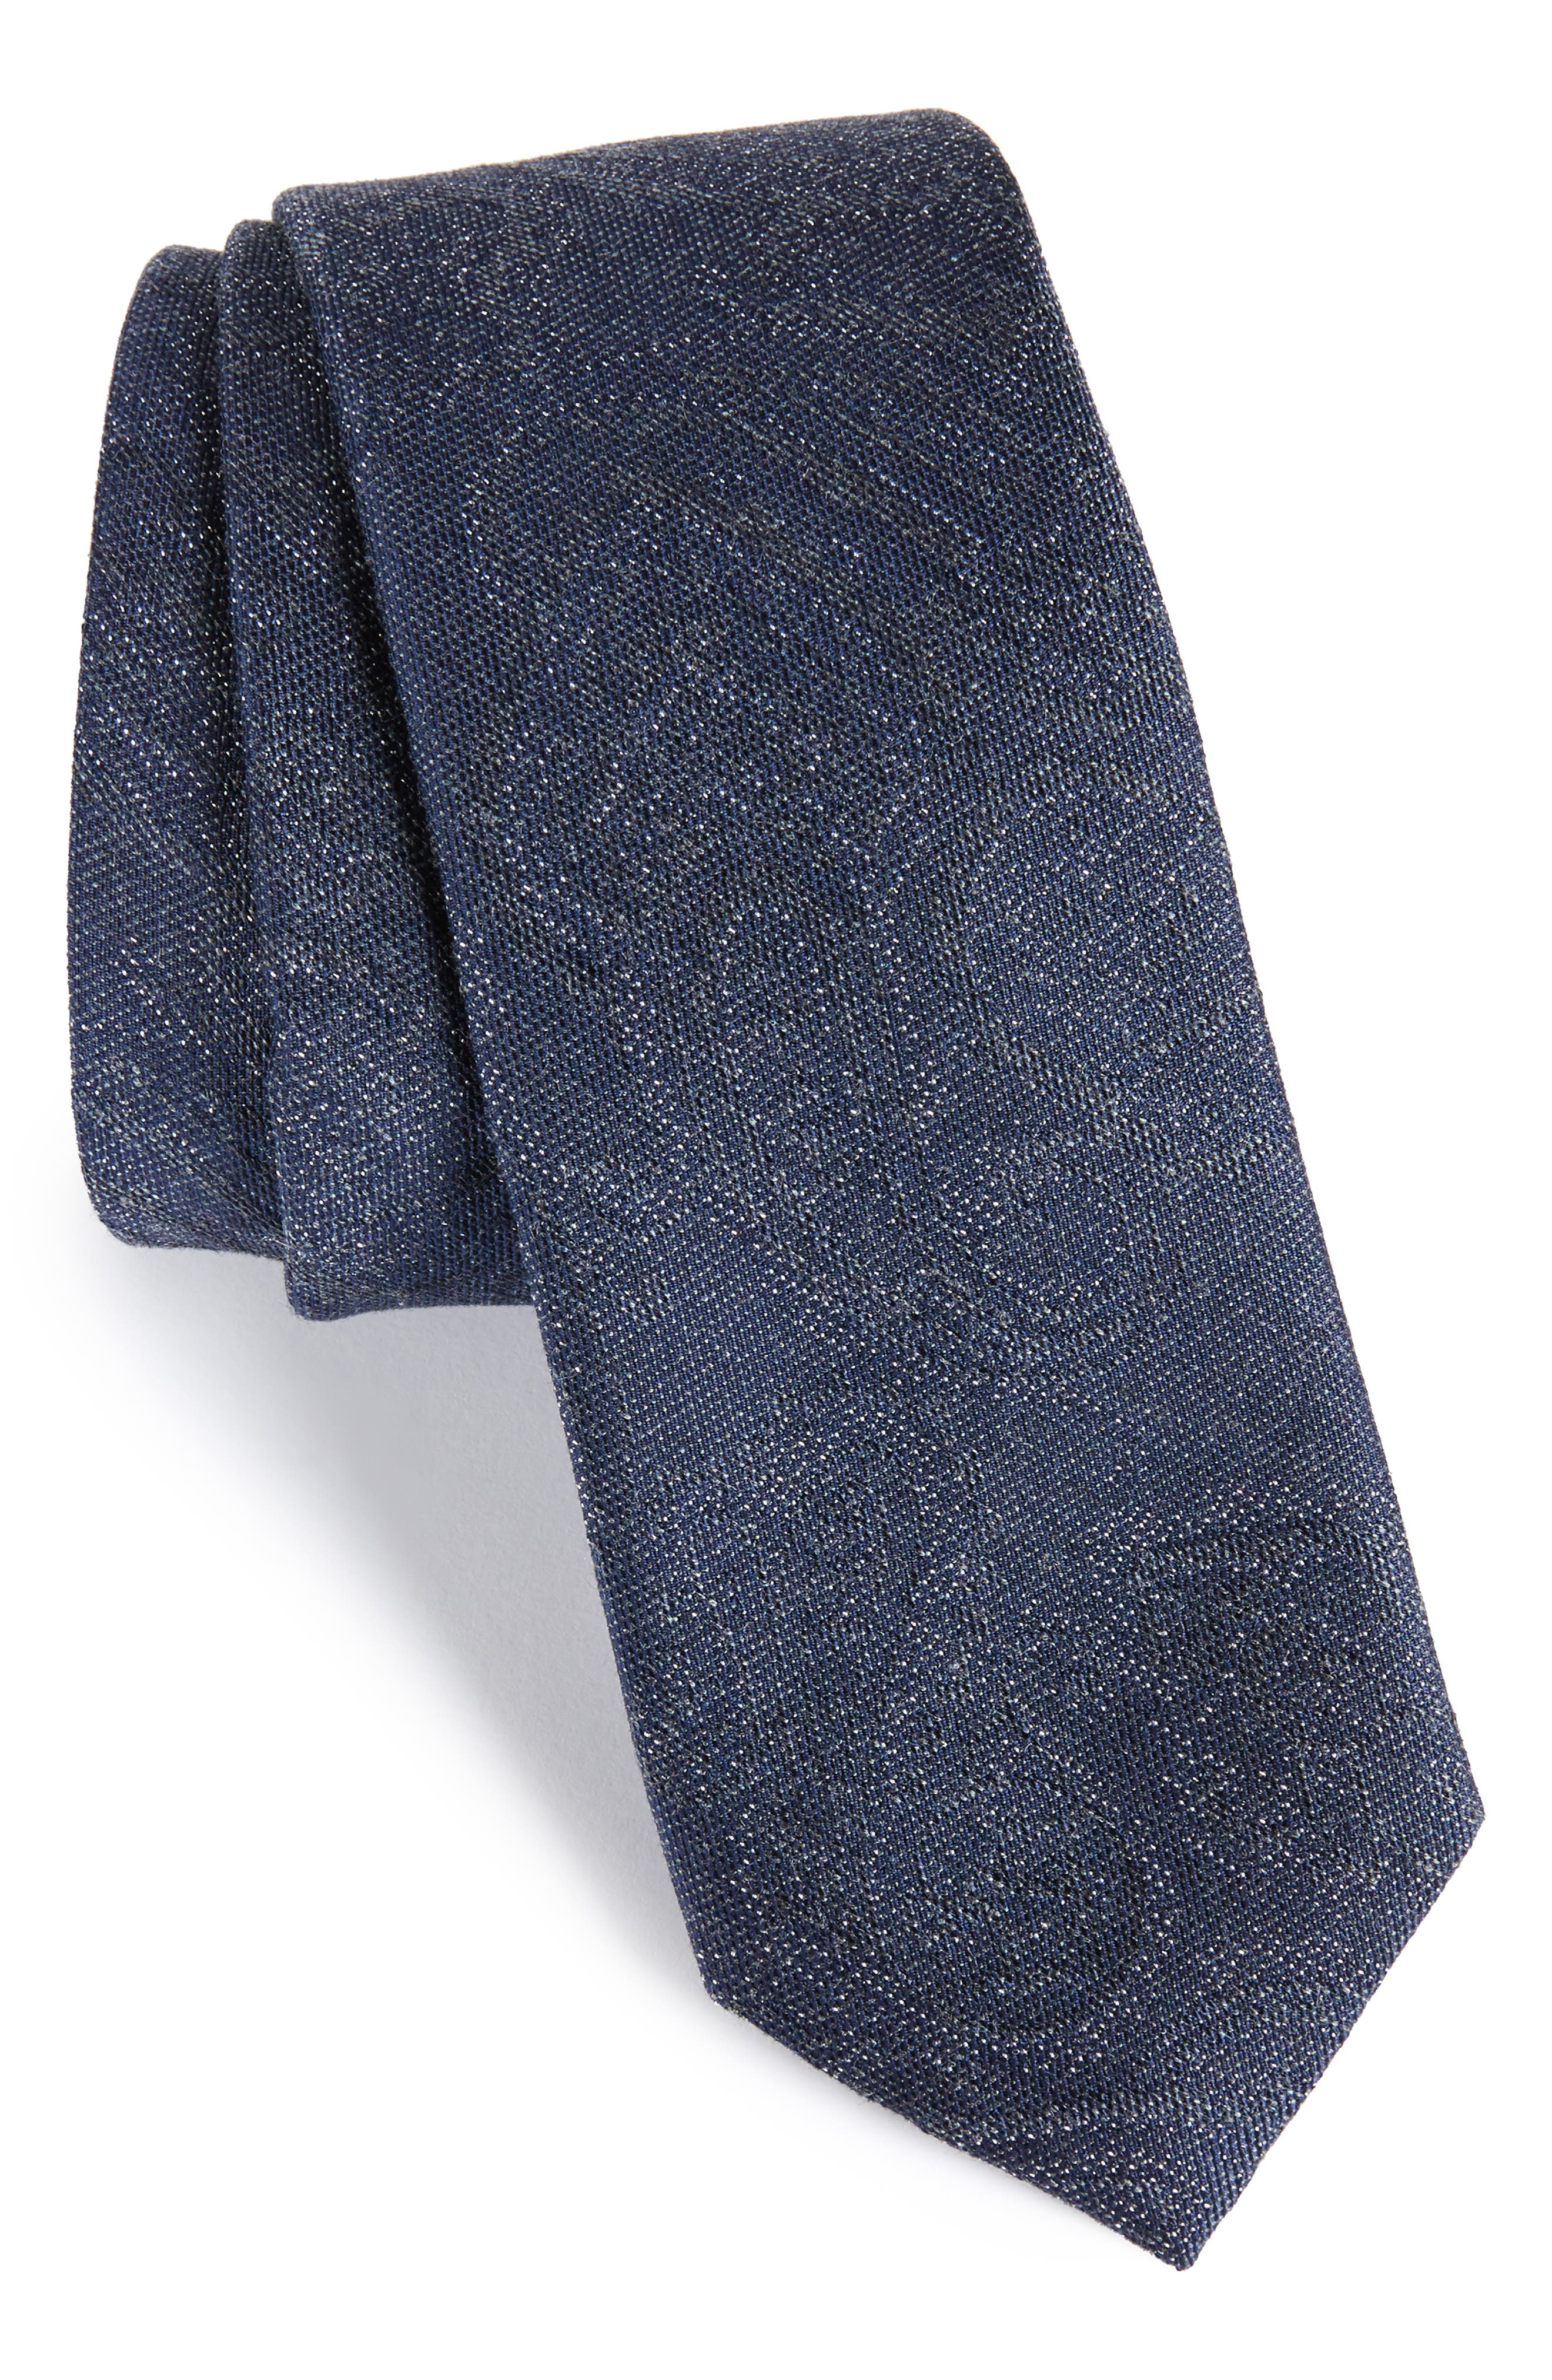 Syne Paisley Silk Blend Tie,                             Main thumbnail 1, color,                             Navy